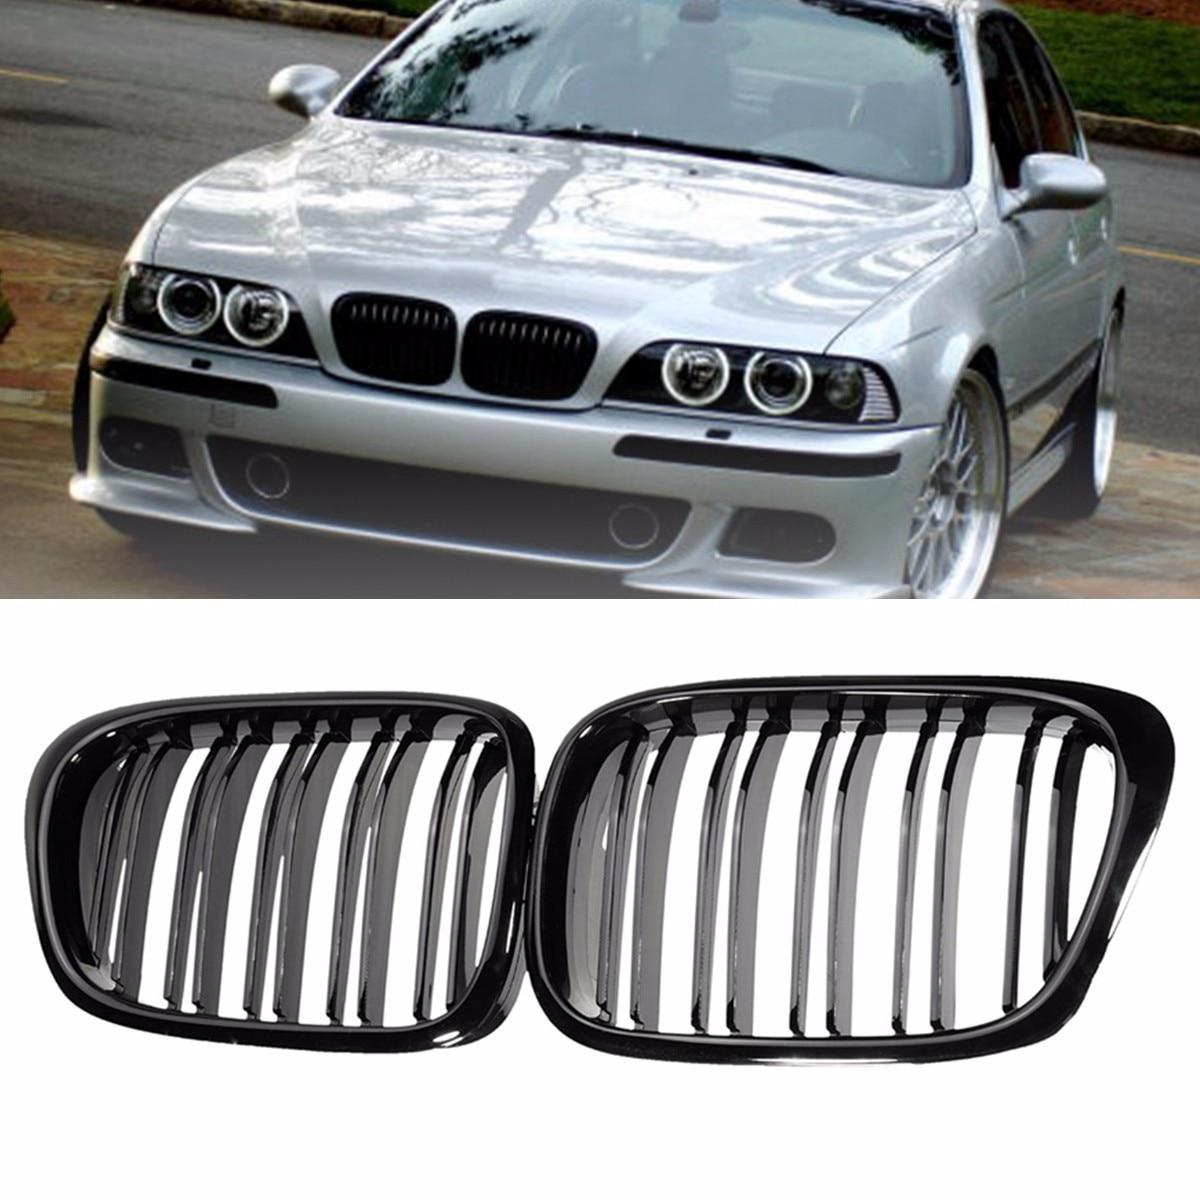 1997-2003 BMW OEM WINDSHIELD SHADE E39 M5 540i 528i 530i 525i 530 528 540 540iT